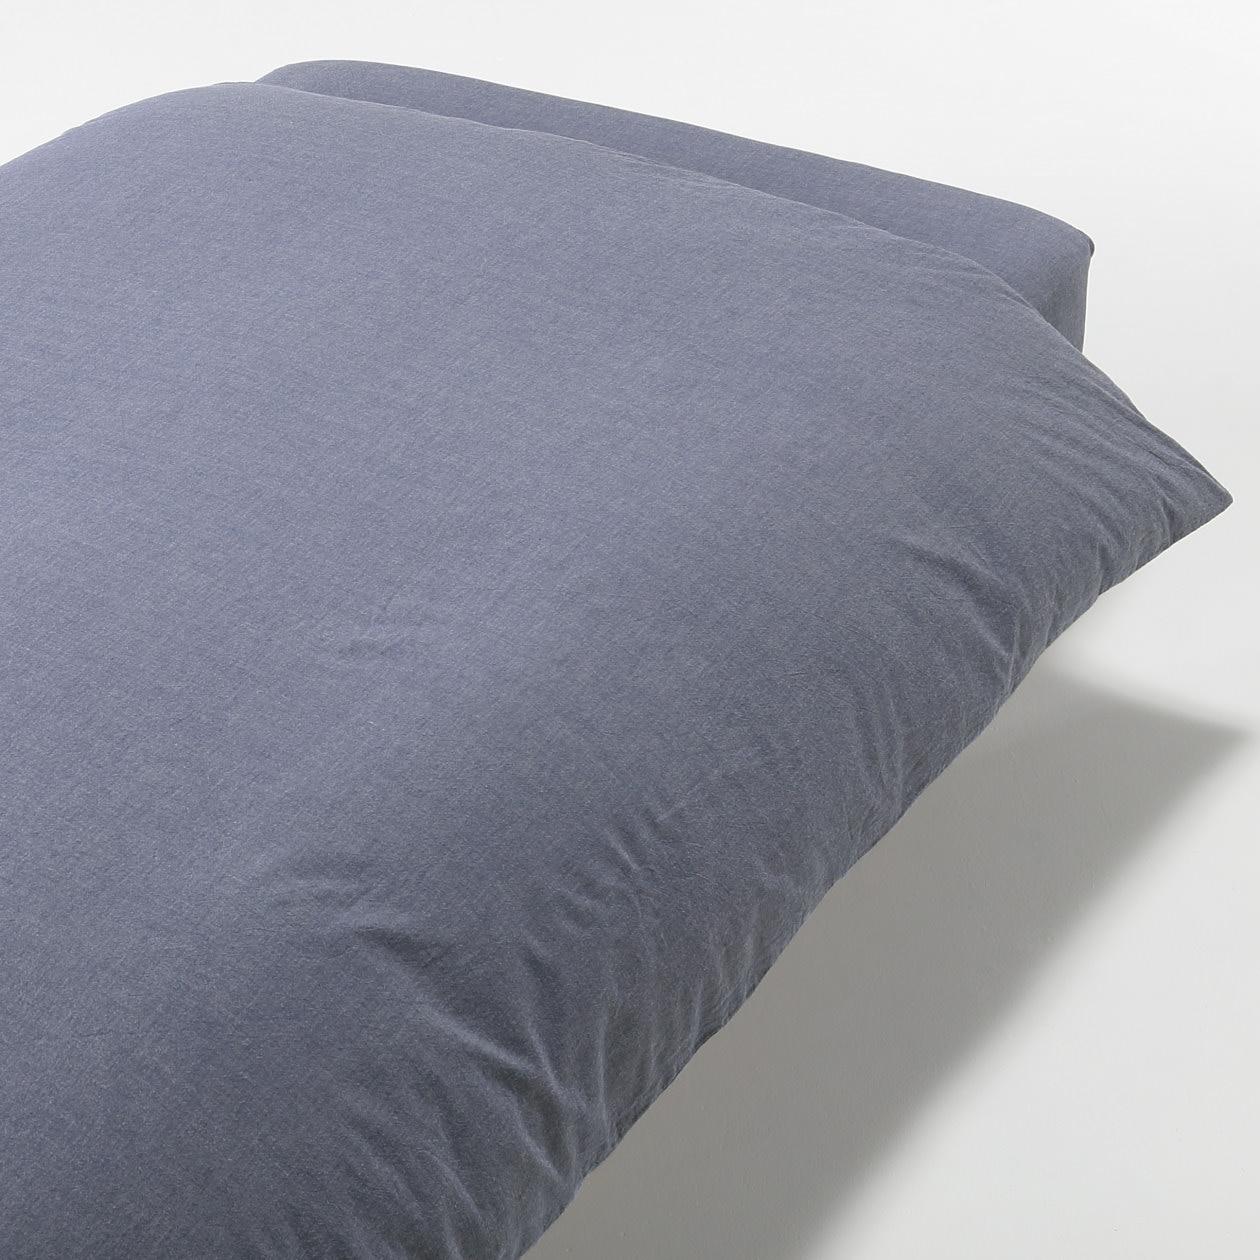 Organic Washed Cotton Duvet Cover 無印良品 Muji